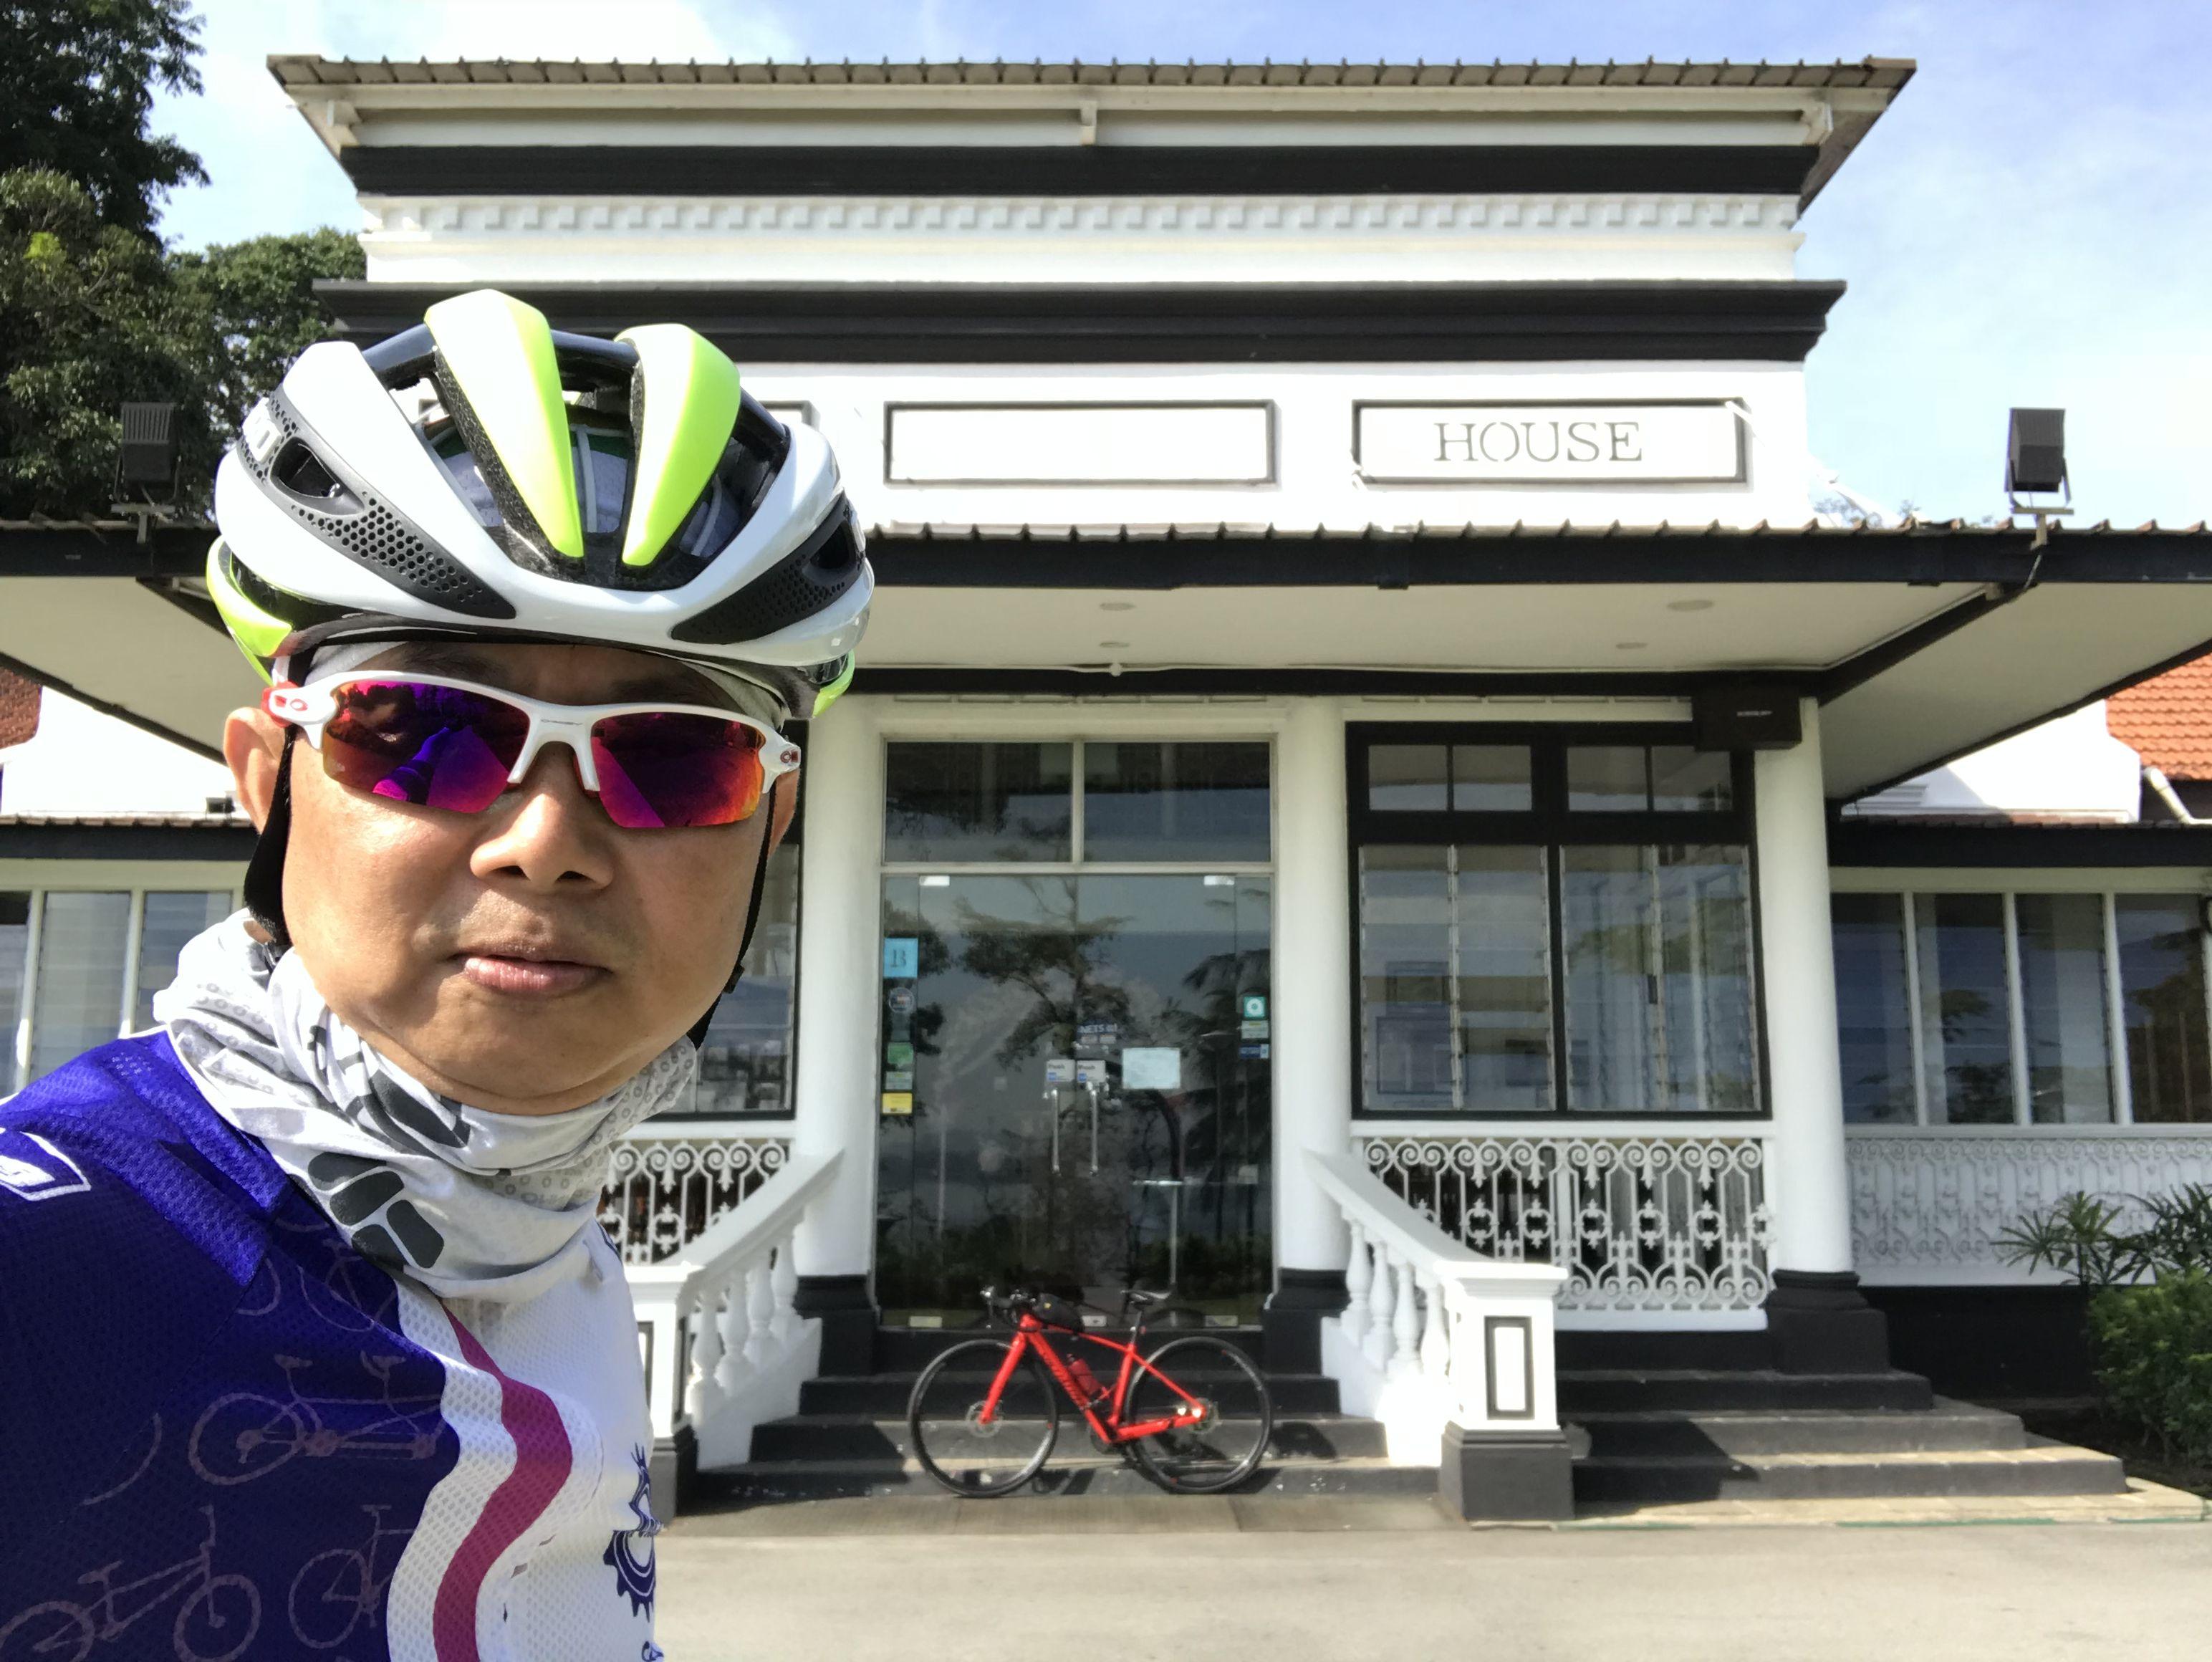 Beaulieu House Bicycle helmet, Cycling, Bicycle